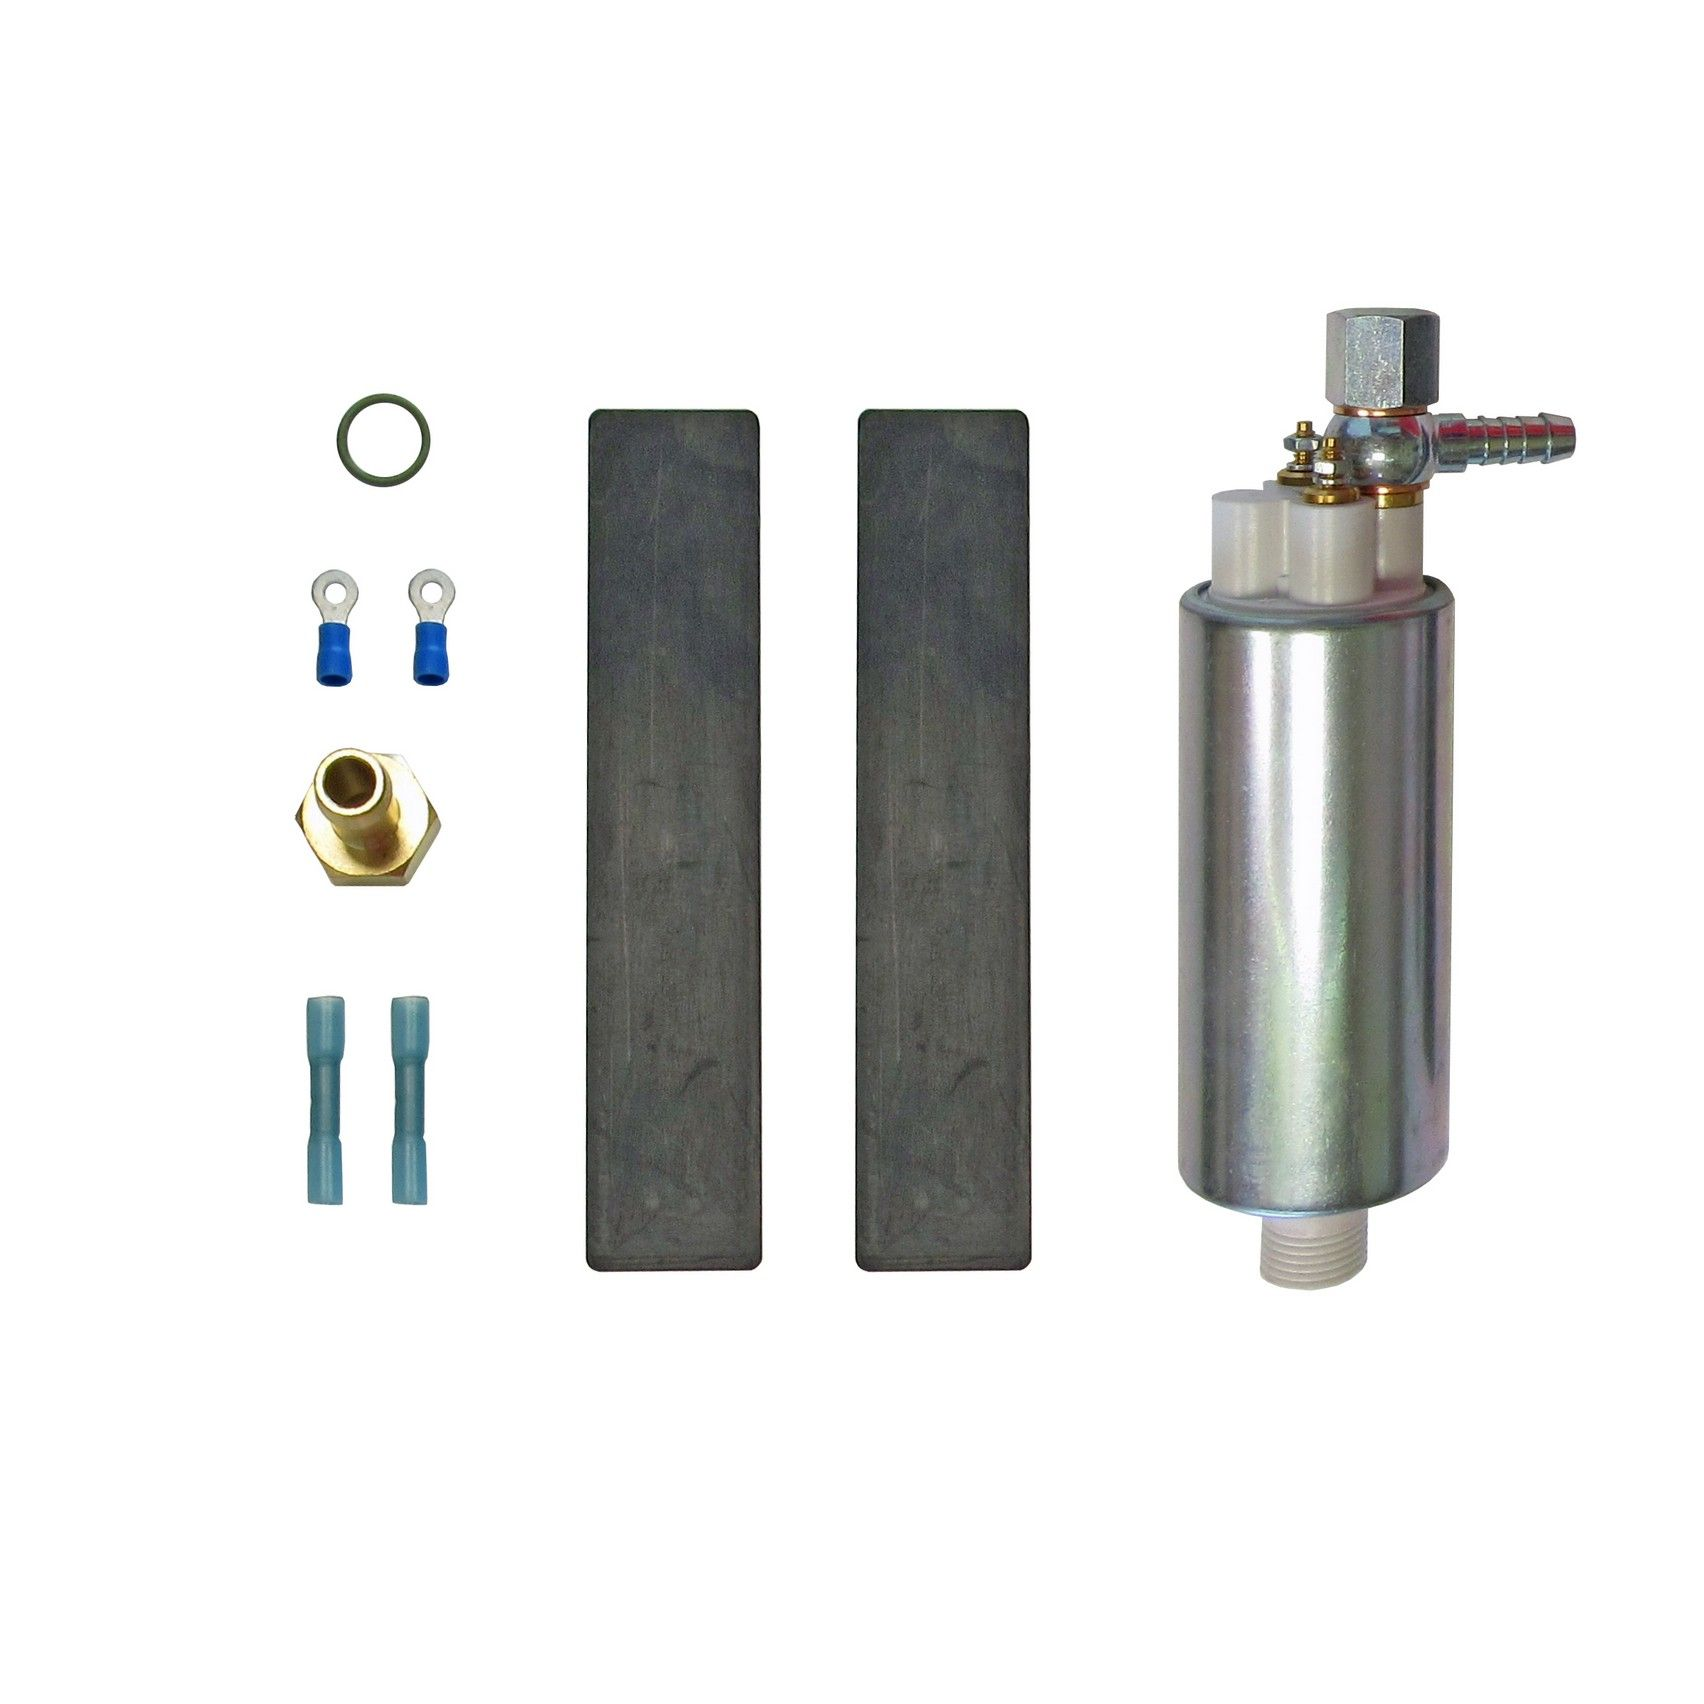 Subaru Gl 10 Electric Fuel Pump Replacement Airtex Autobest 1981 Filter Location 1985 4 Cyl 18l F4323